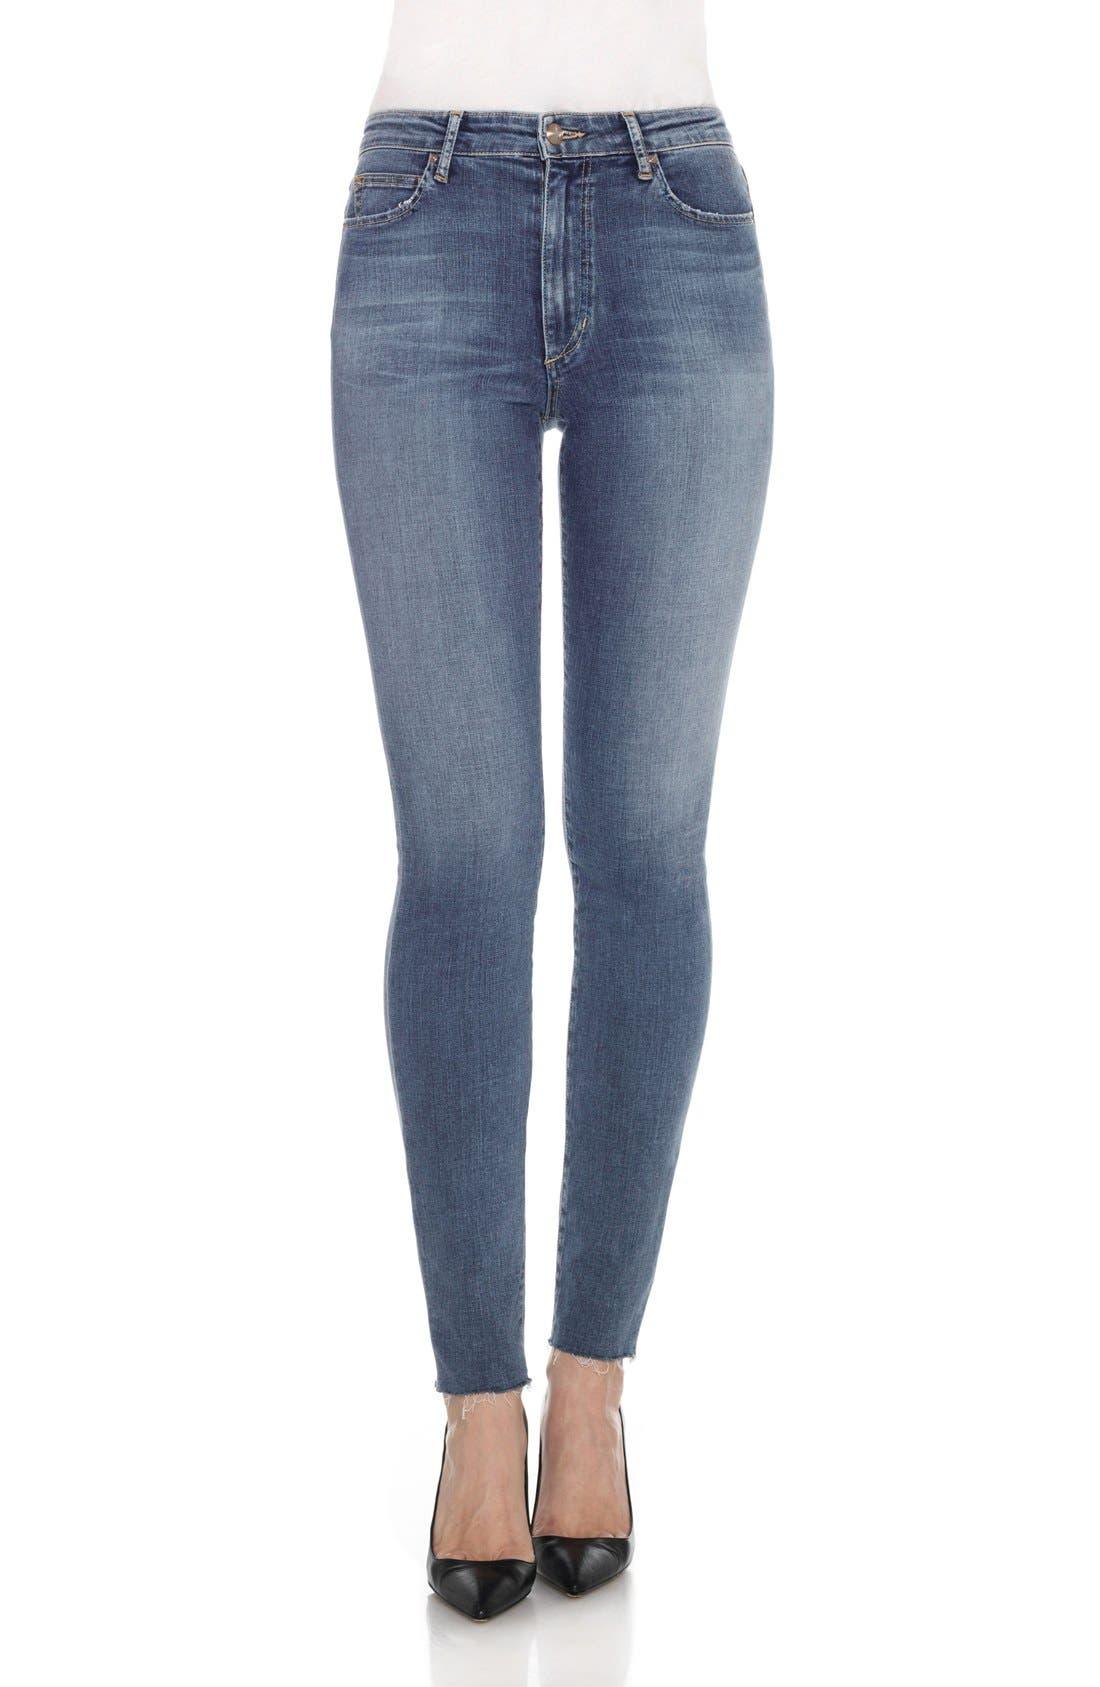 Joes Flawless Charlie High Rise Skinny Jeans (Vani)